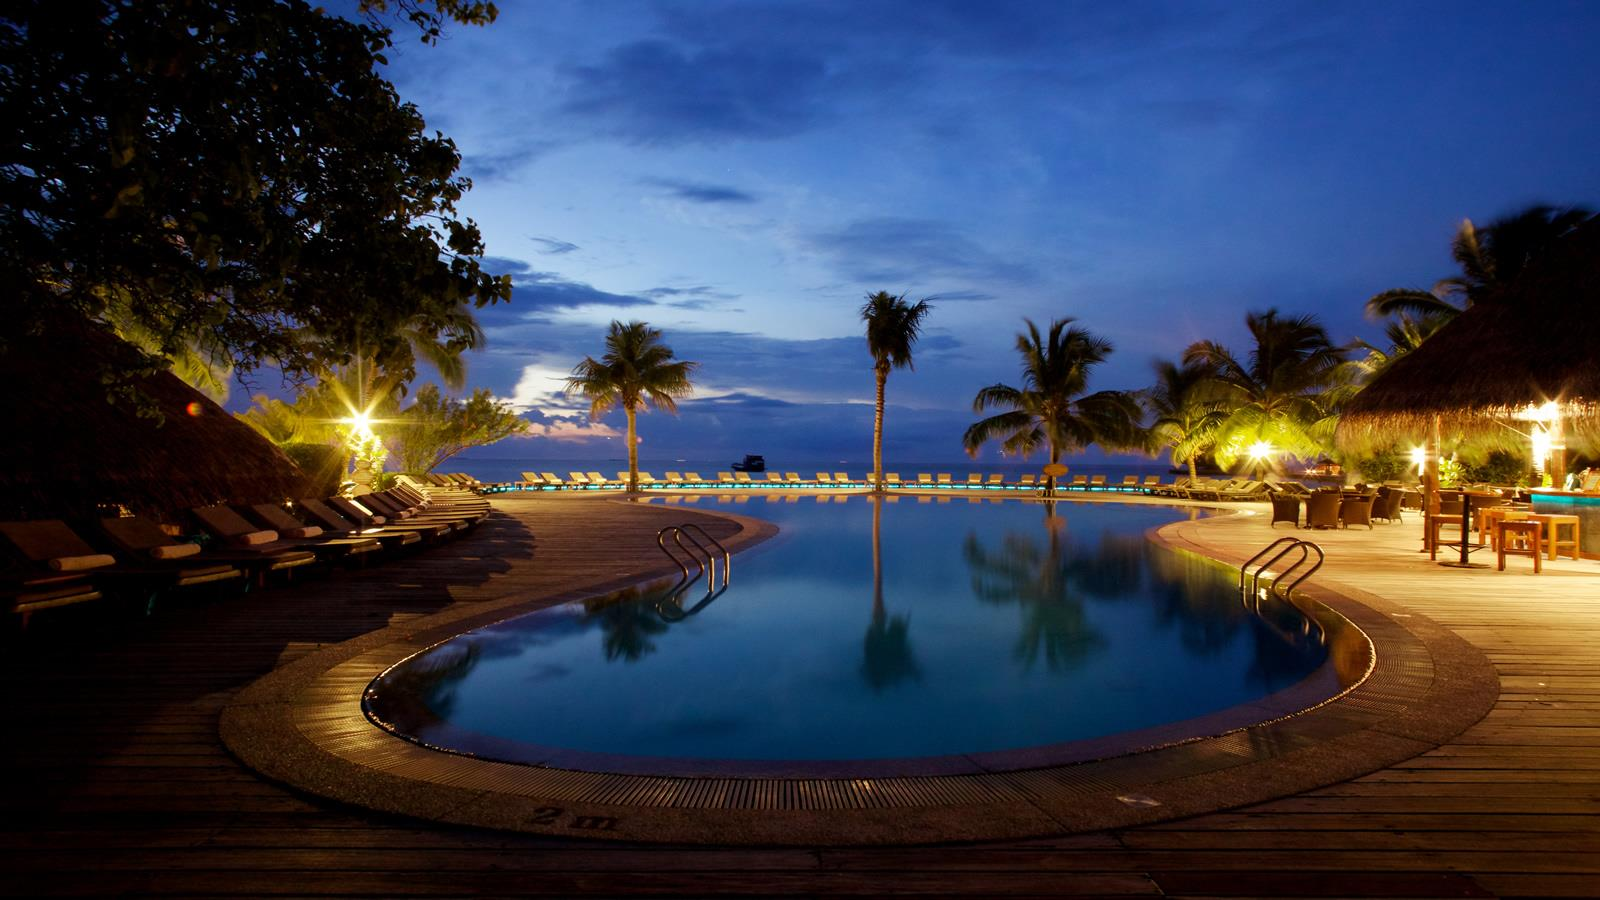 kuredu-island-resort-spa-genel-004